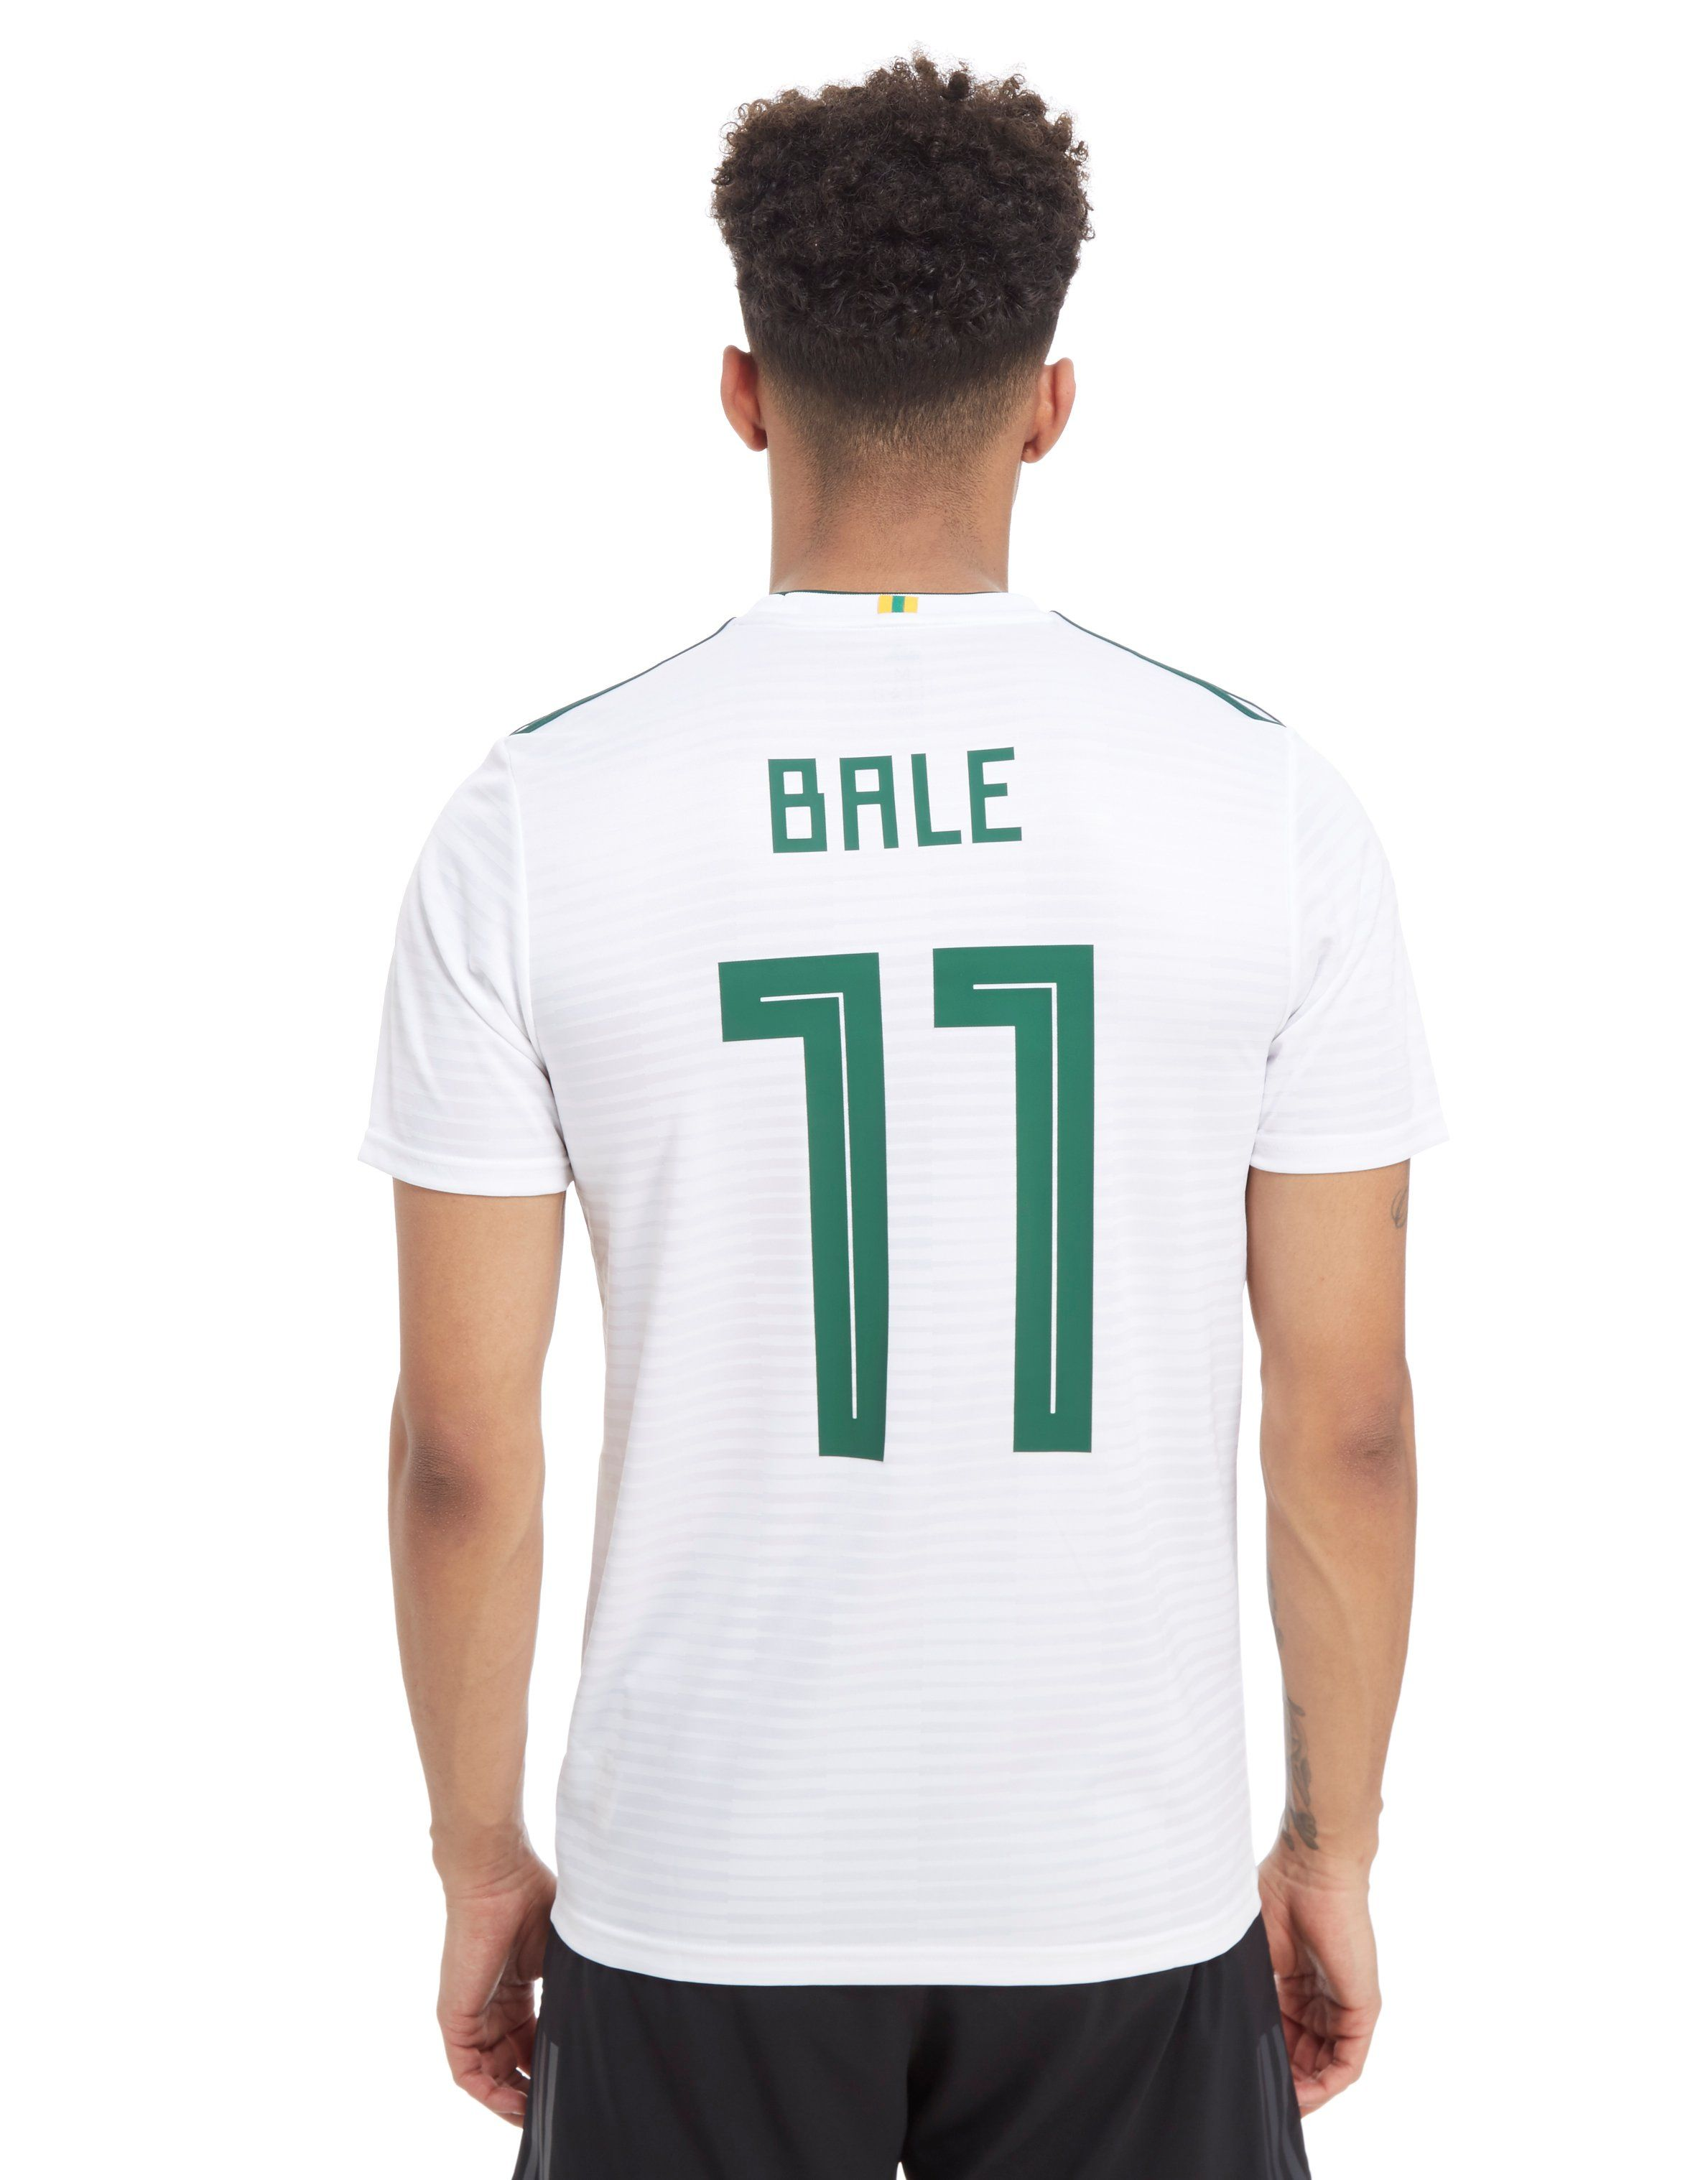 69ea73dbcb7 adidas Wales 2018 Away Bale #11 Shirt   JD Sports